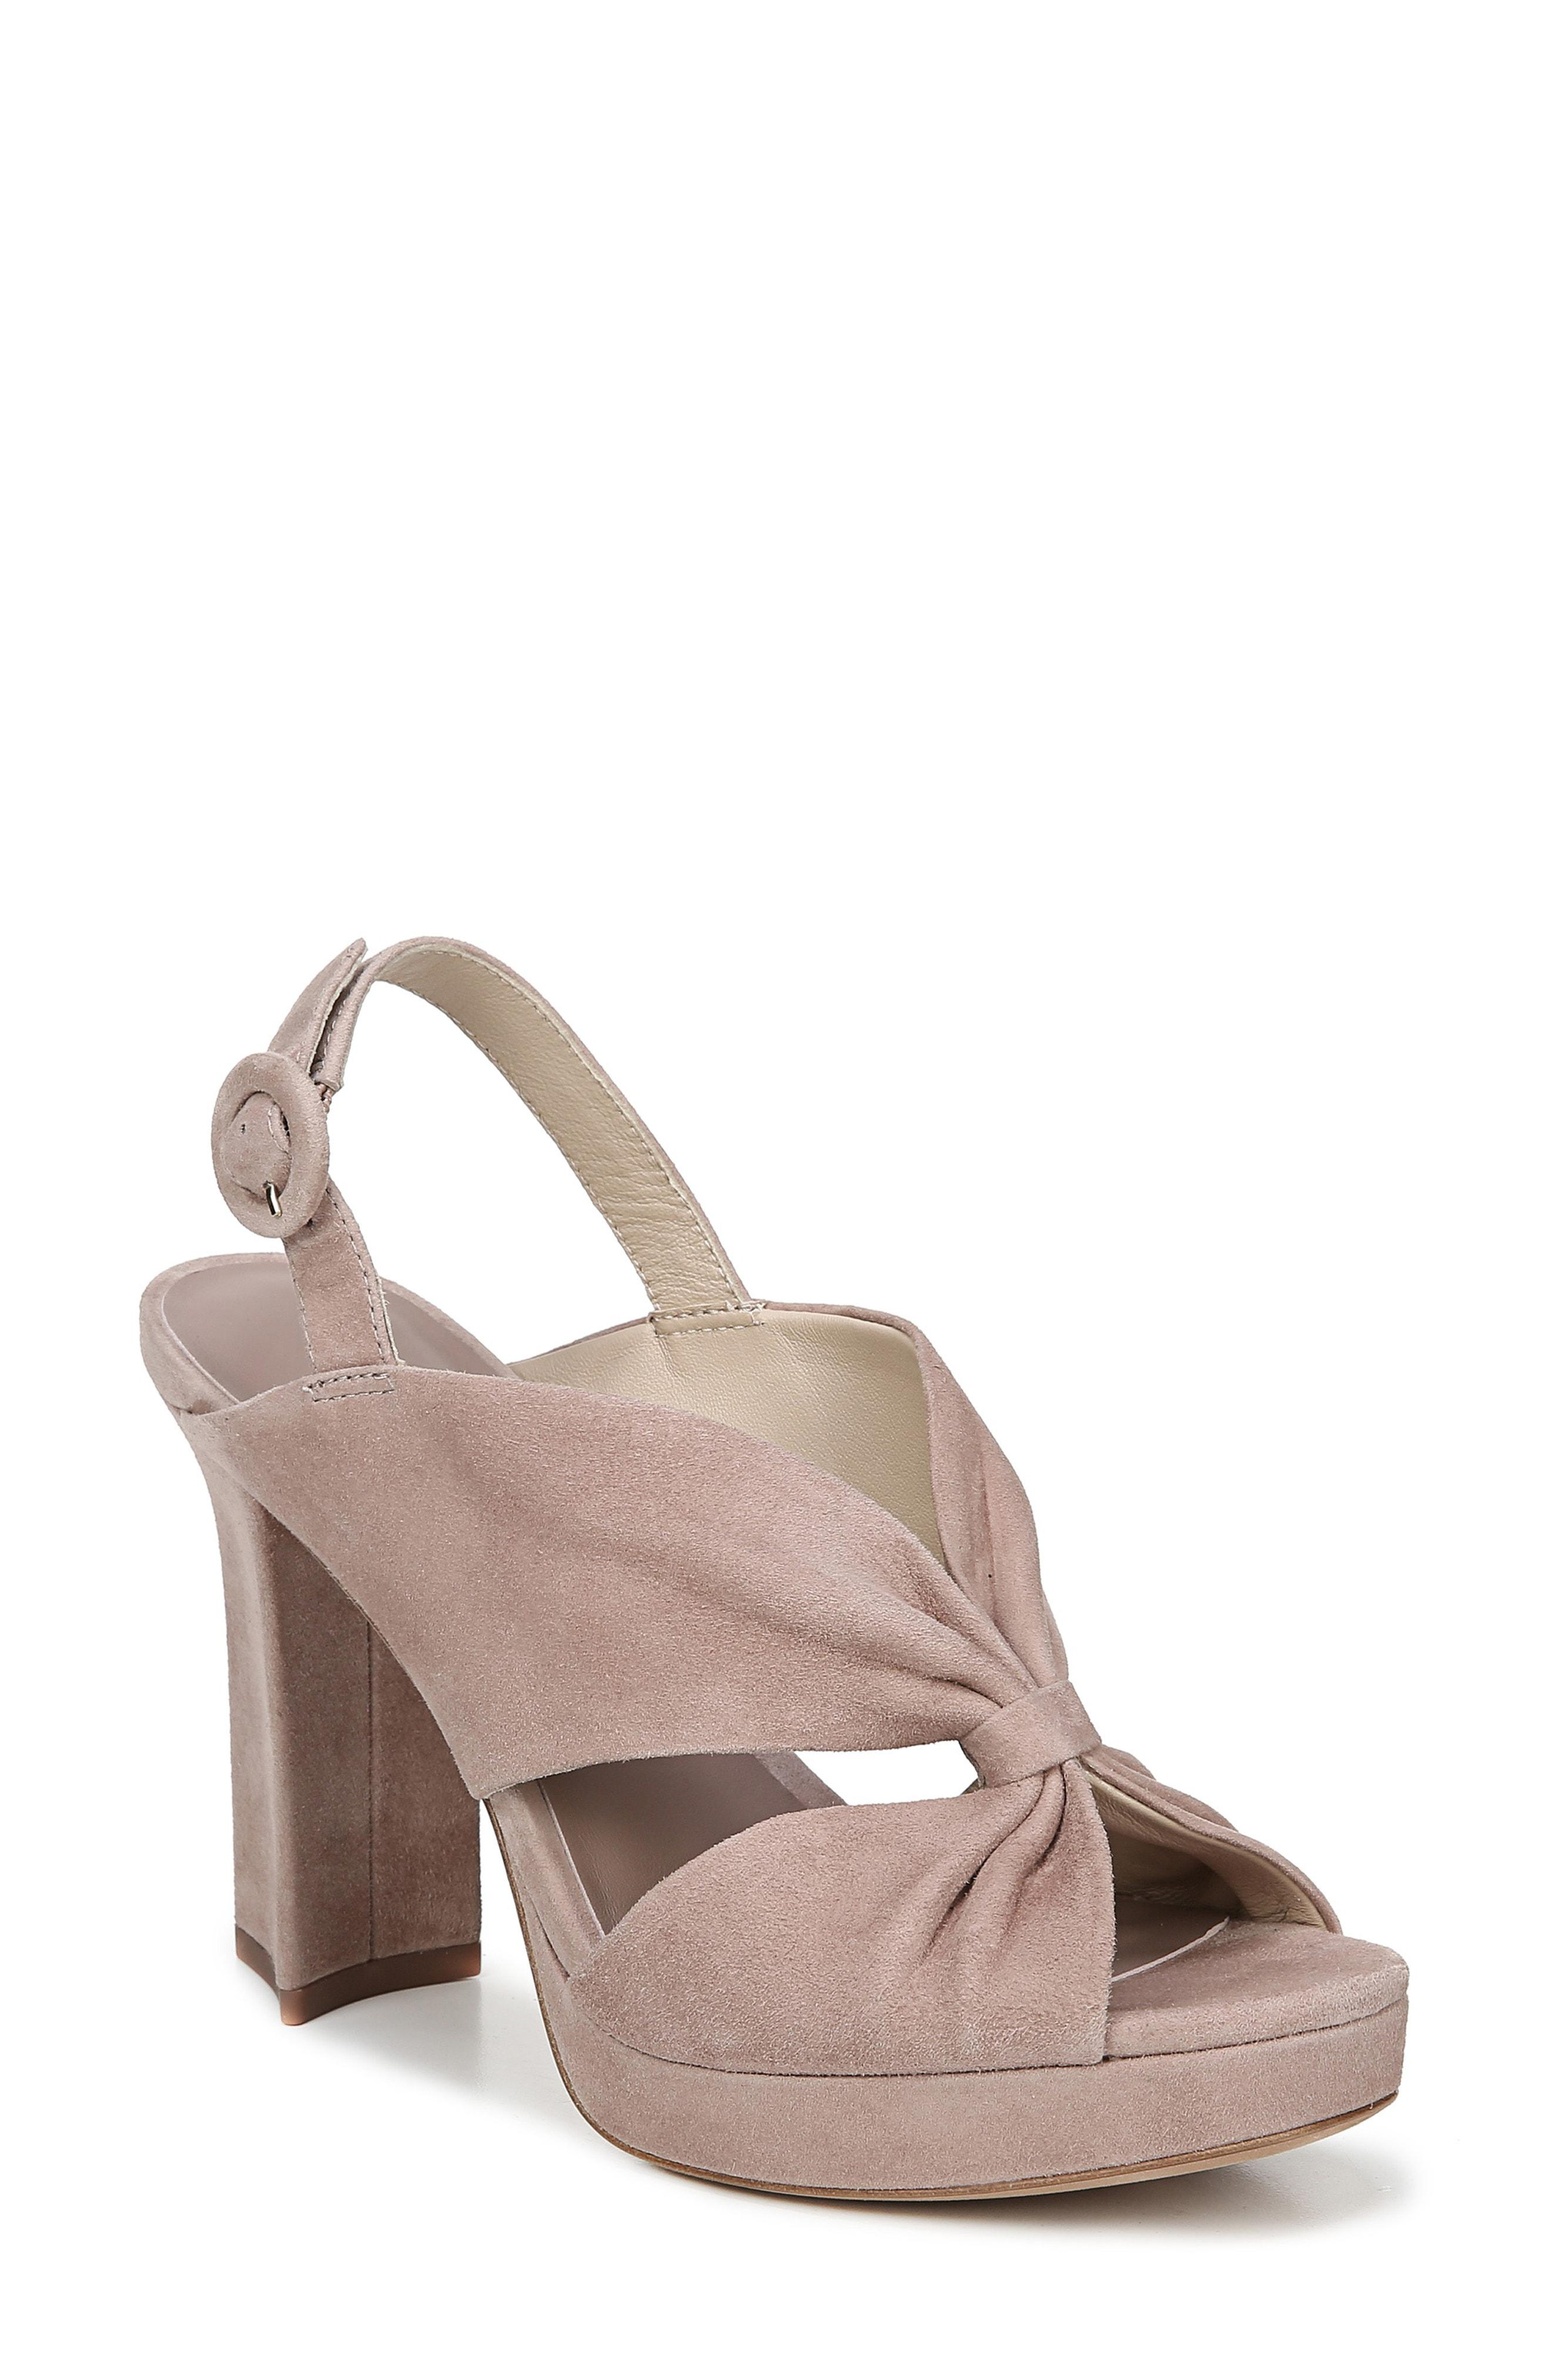 798aab00987 Lyst - Diane von Furstenberg Heidi Slingback Block Heel Sandals ...